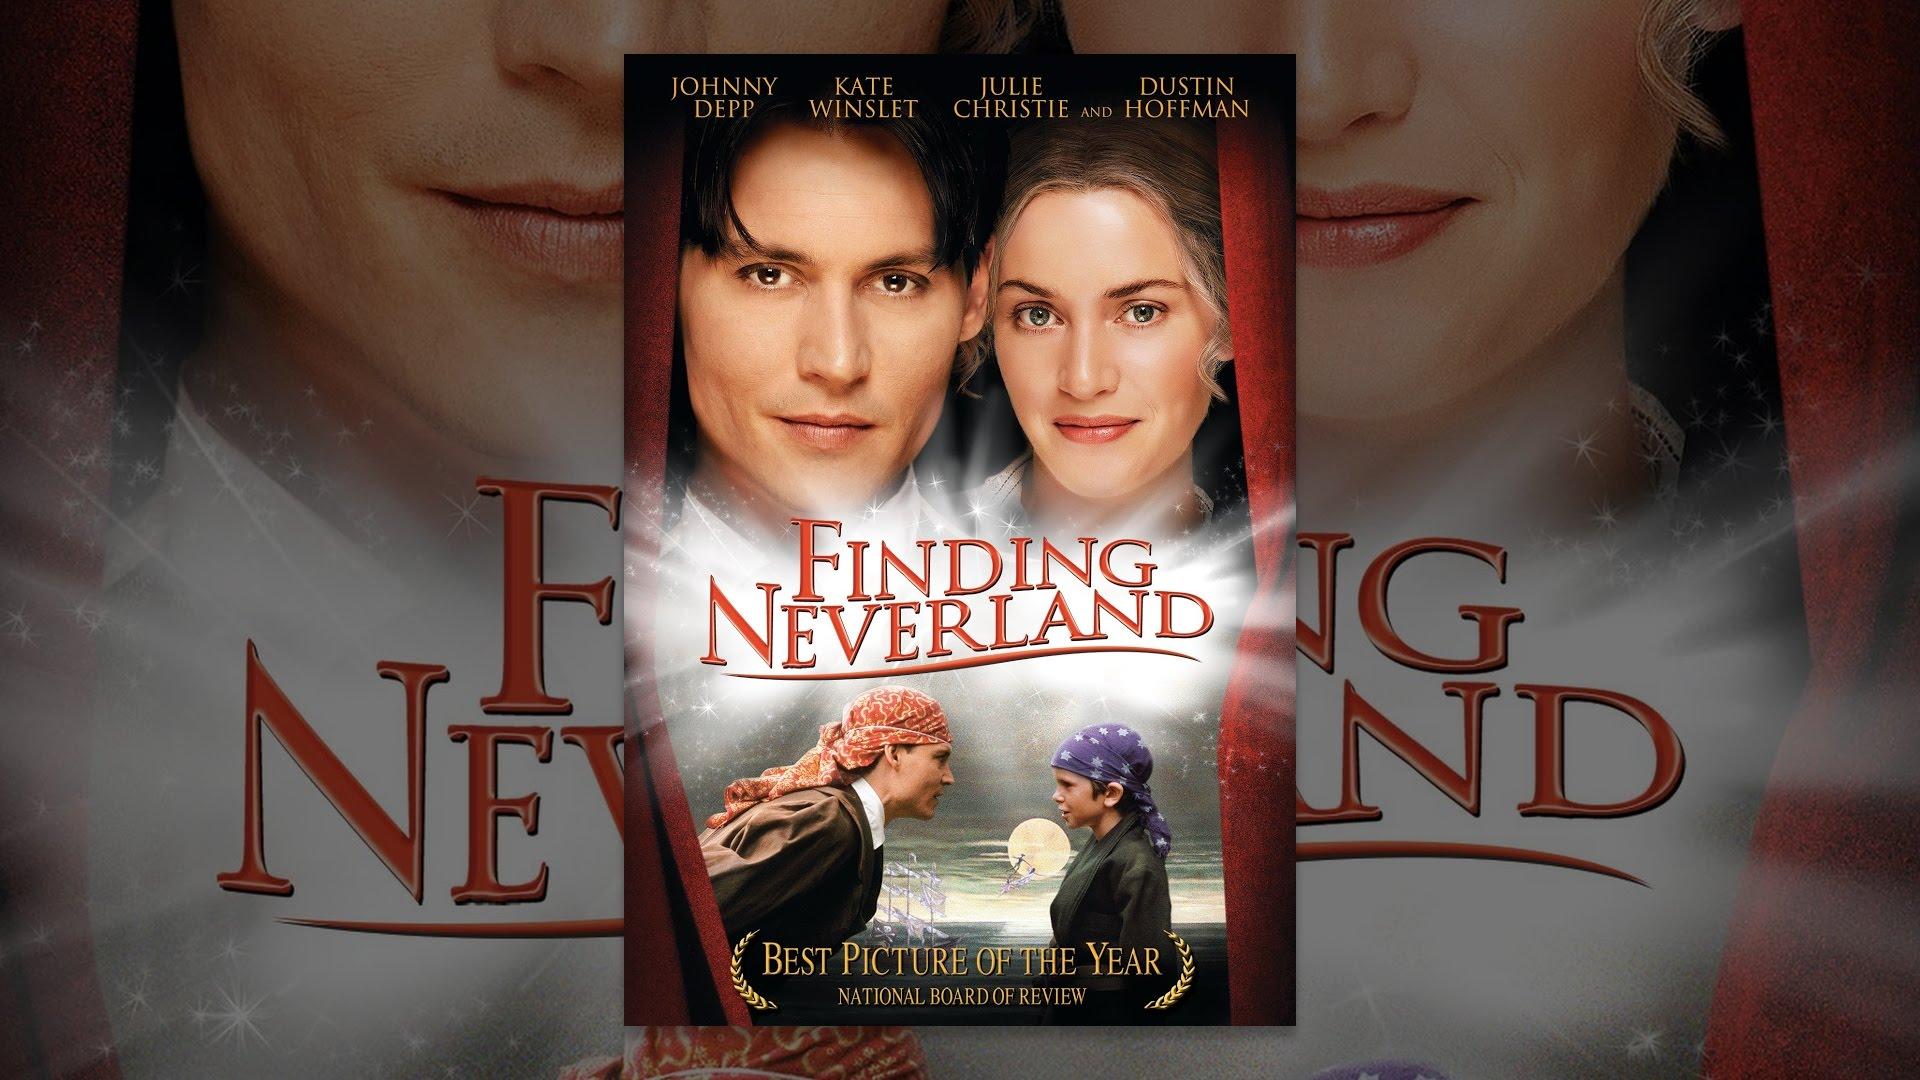 Finding Neverland | Official Trailer (HD) - Johnny Depp, Kate Winslet